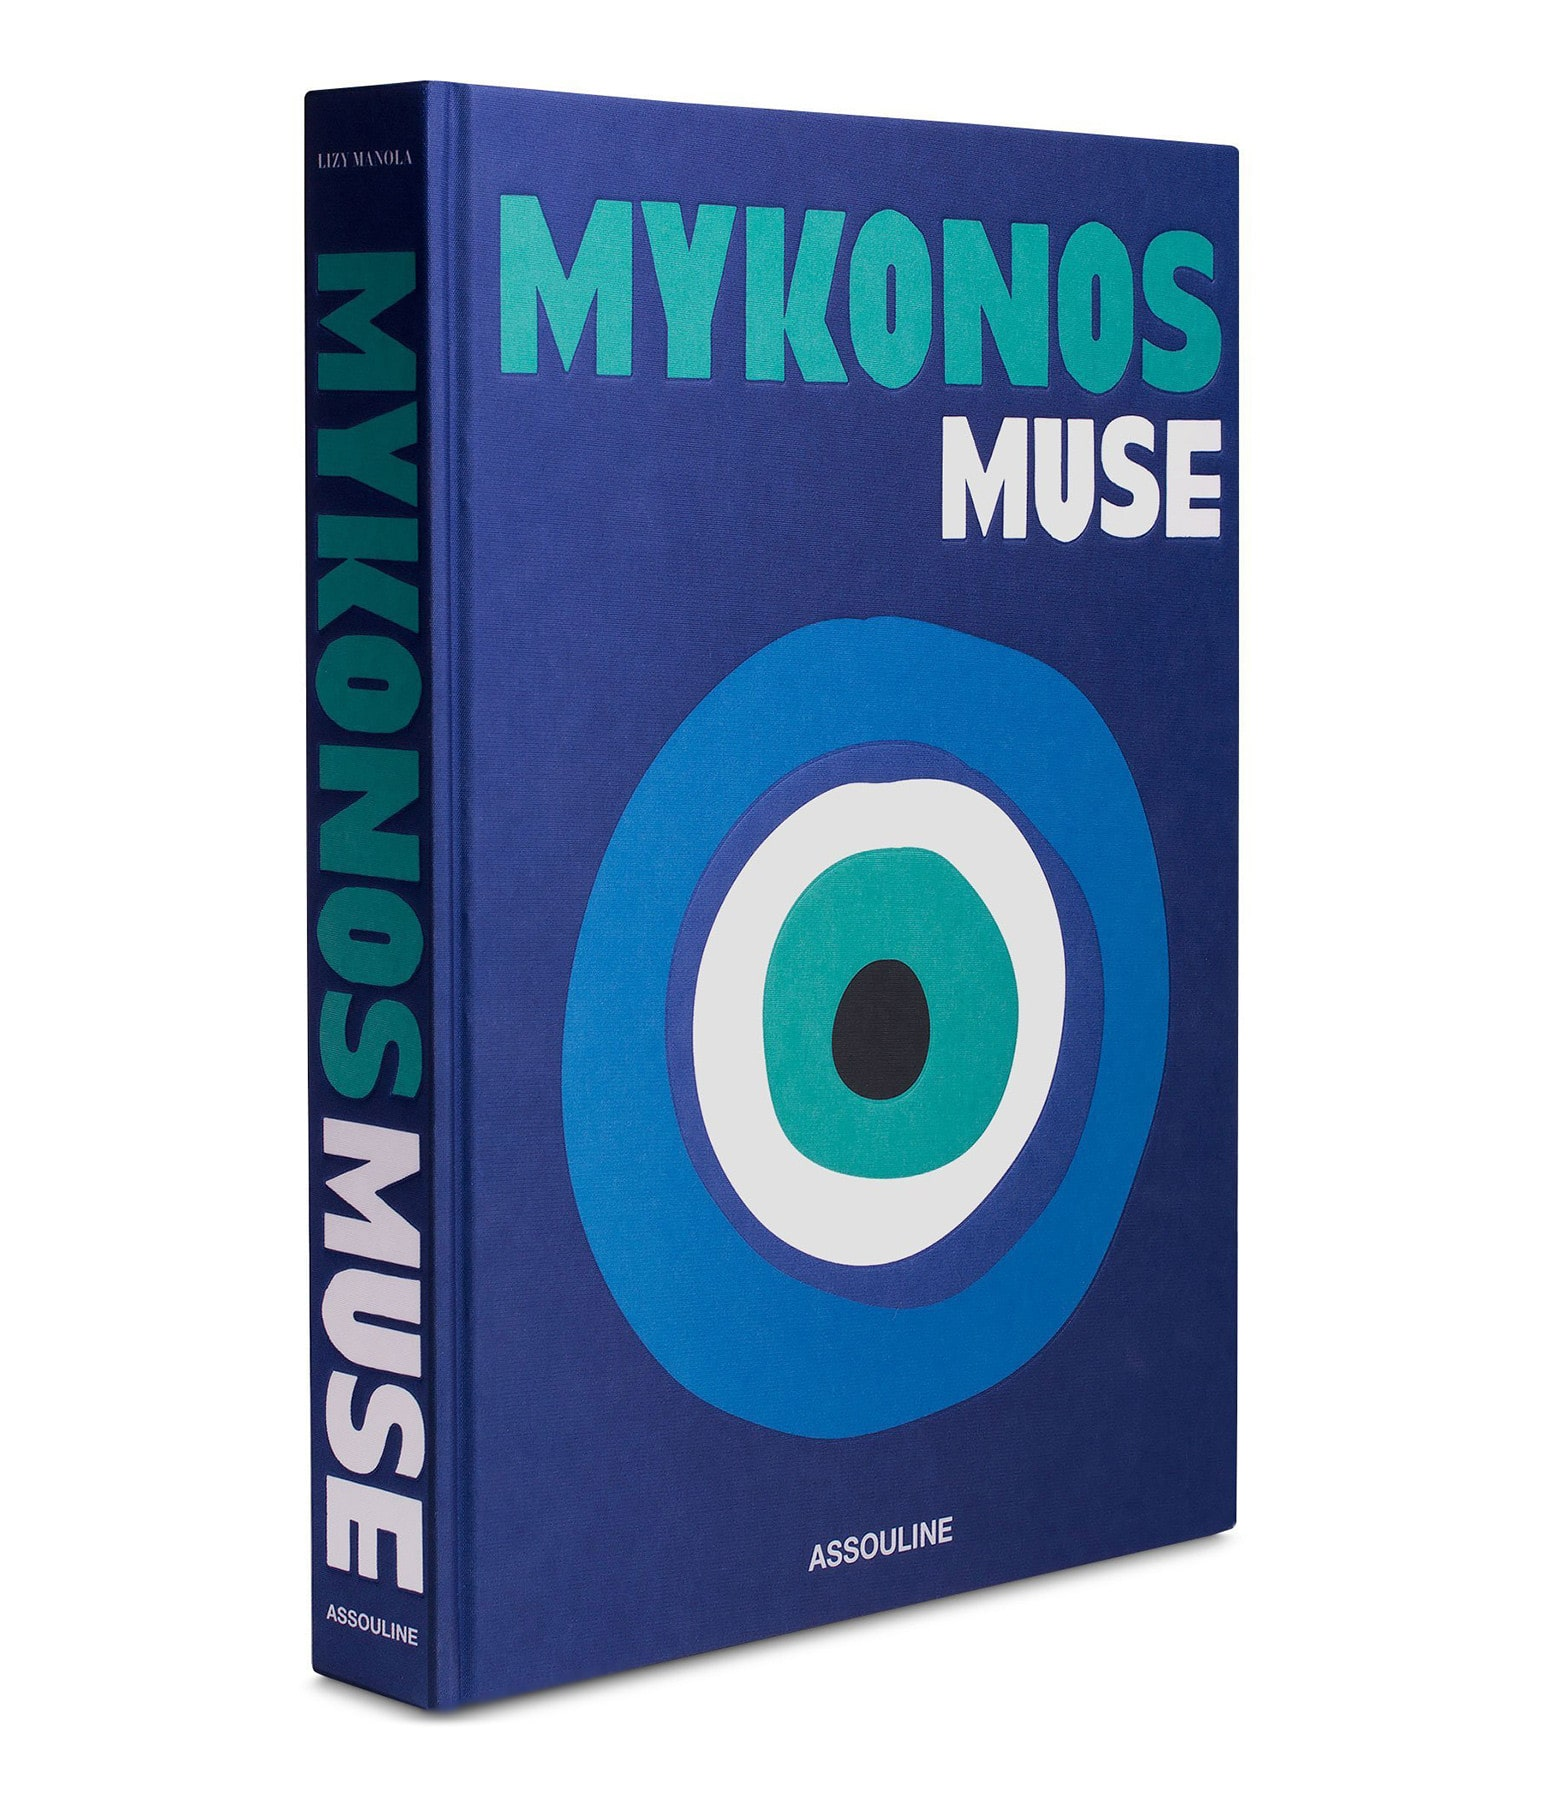 ASSOULINE - Livre Mykonos Muse